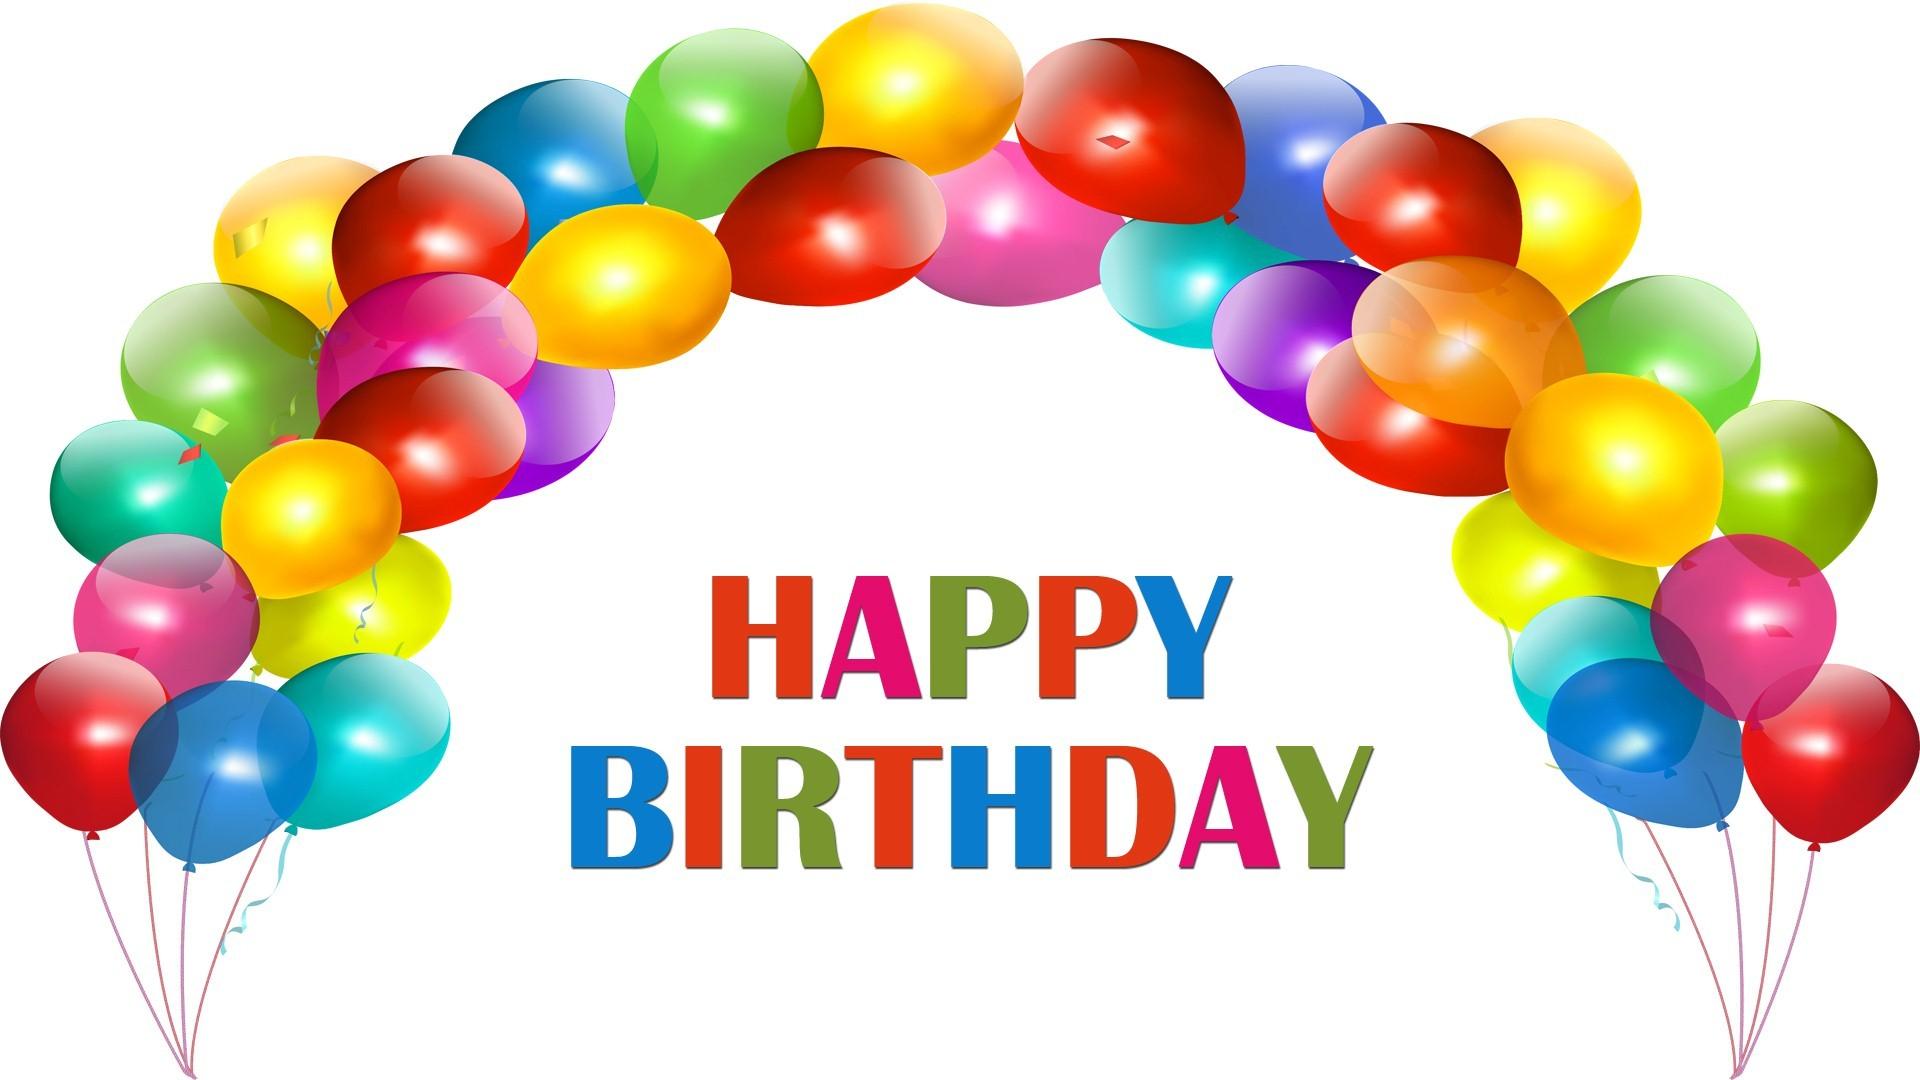 Happy Birthday Wallpaper 64 Images